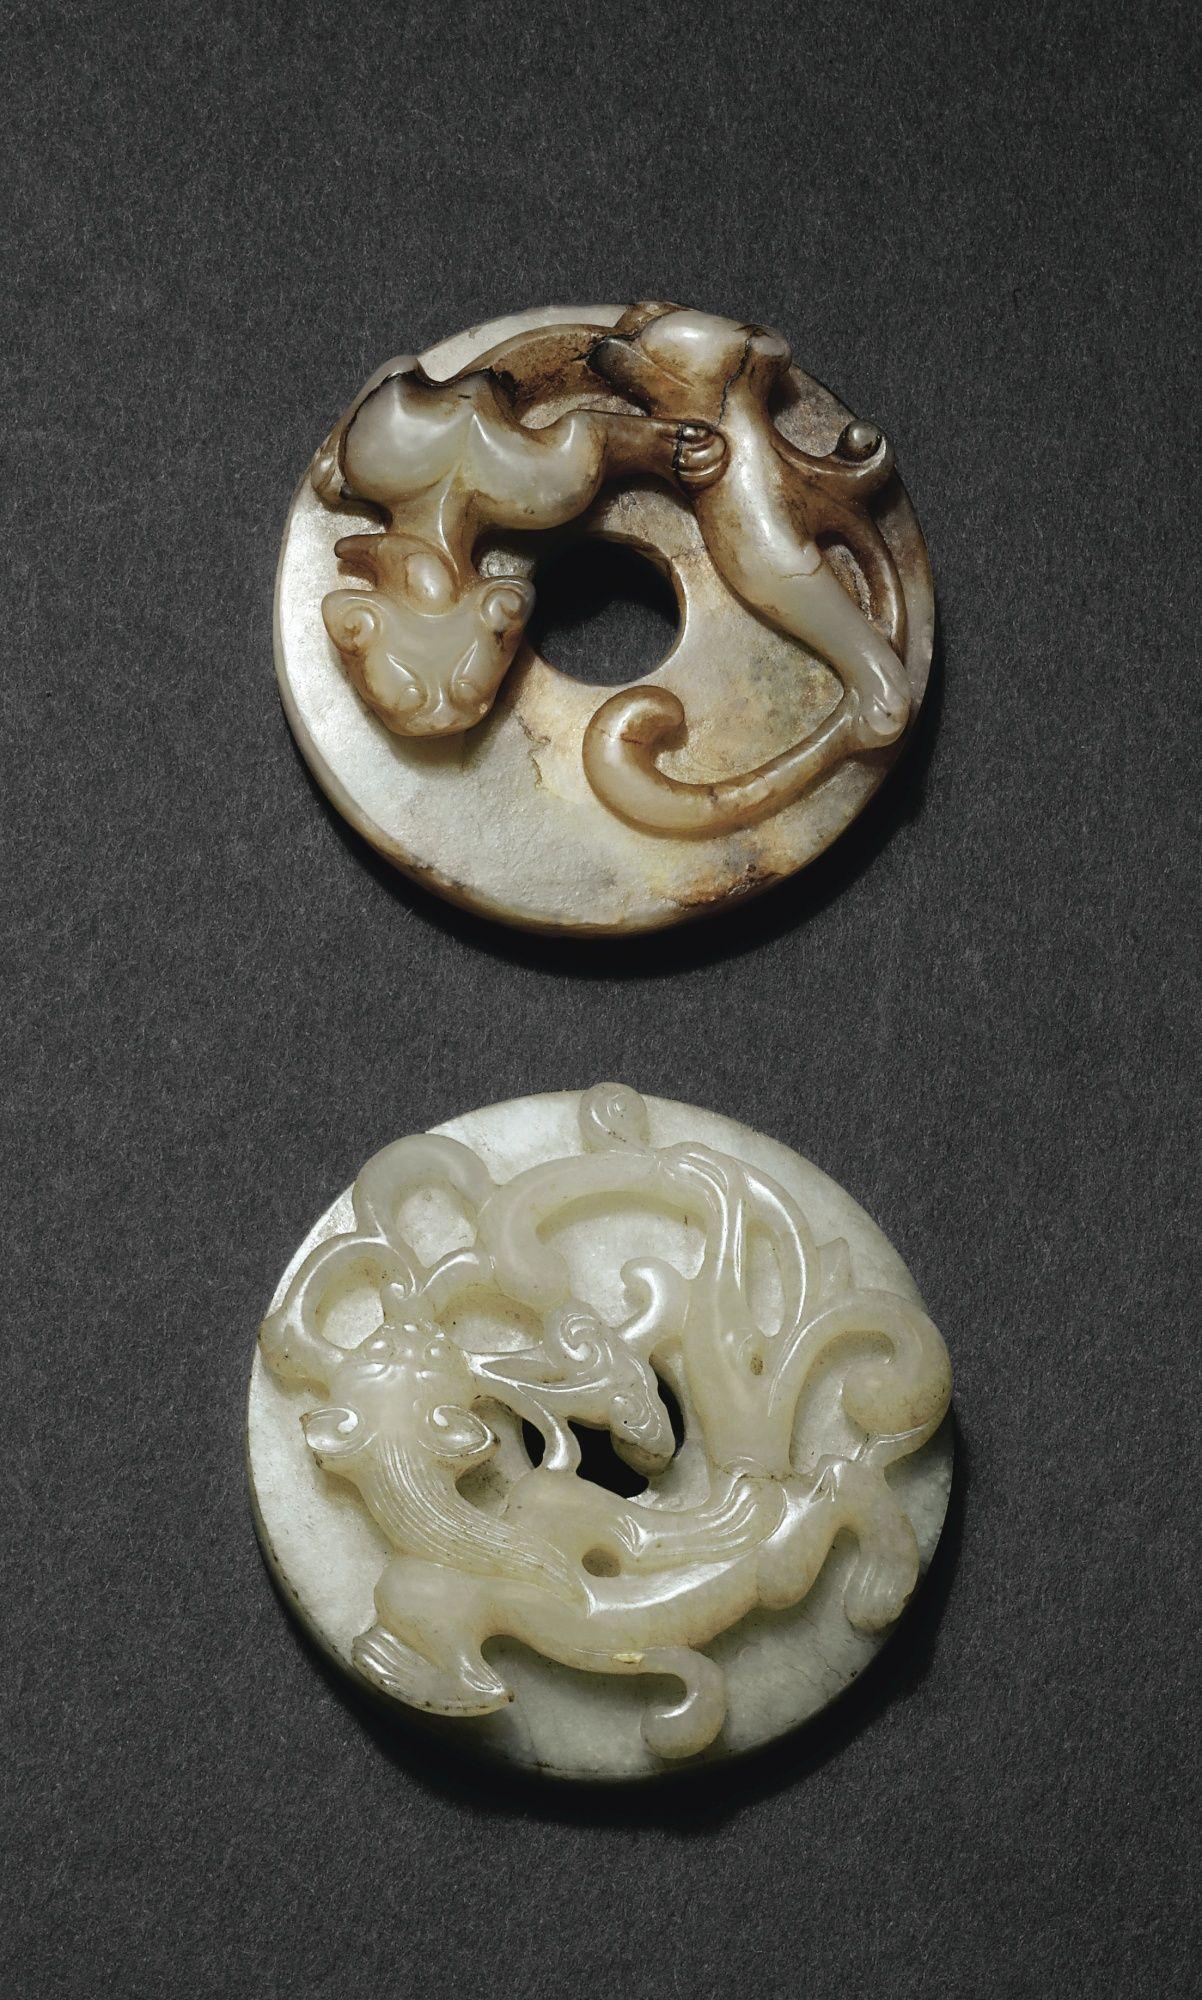 Jp two archaistic jade discs bi china ming dynasty chinese jp two archaistic jade discs bi china ming dynasty chinese antiques and aloadofball Choice Image